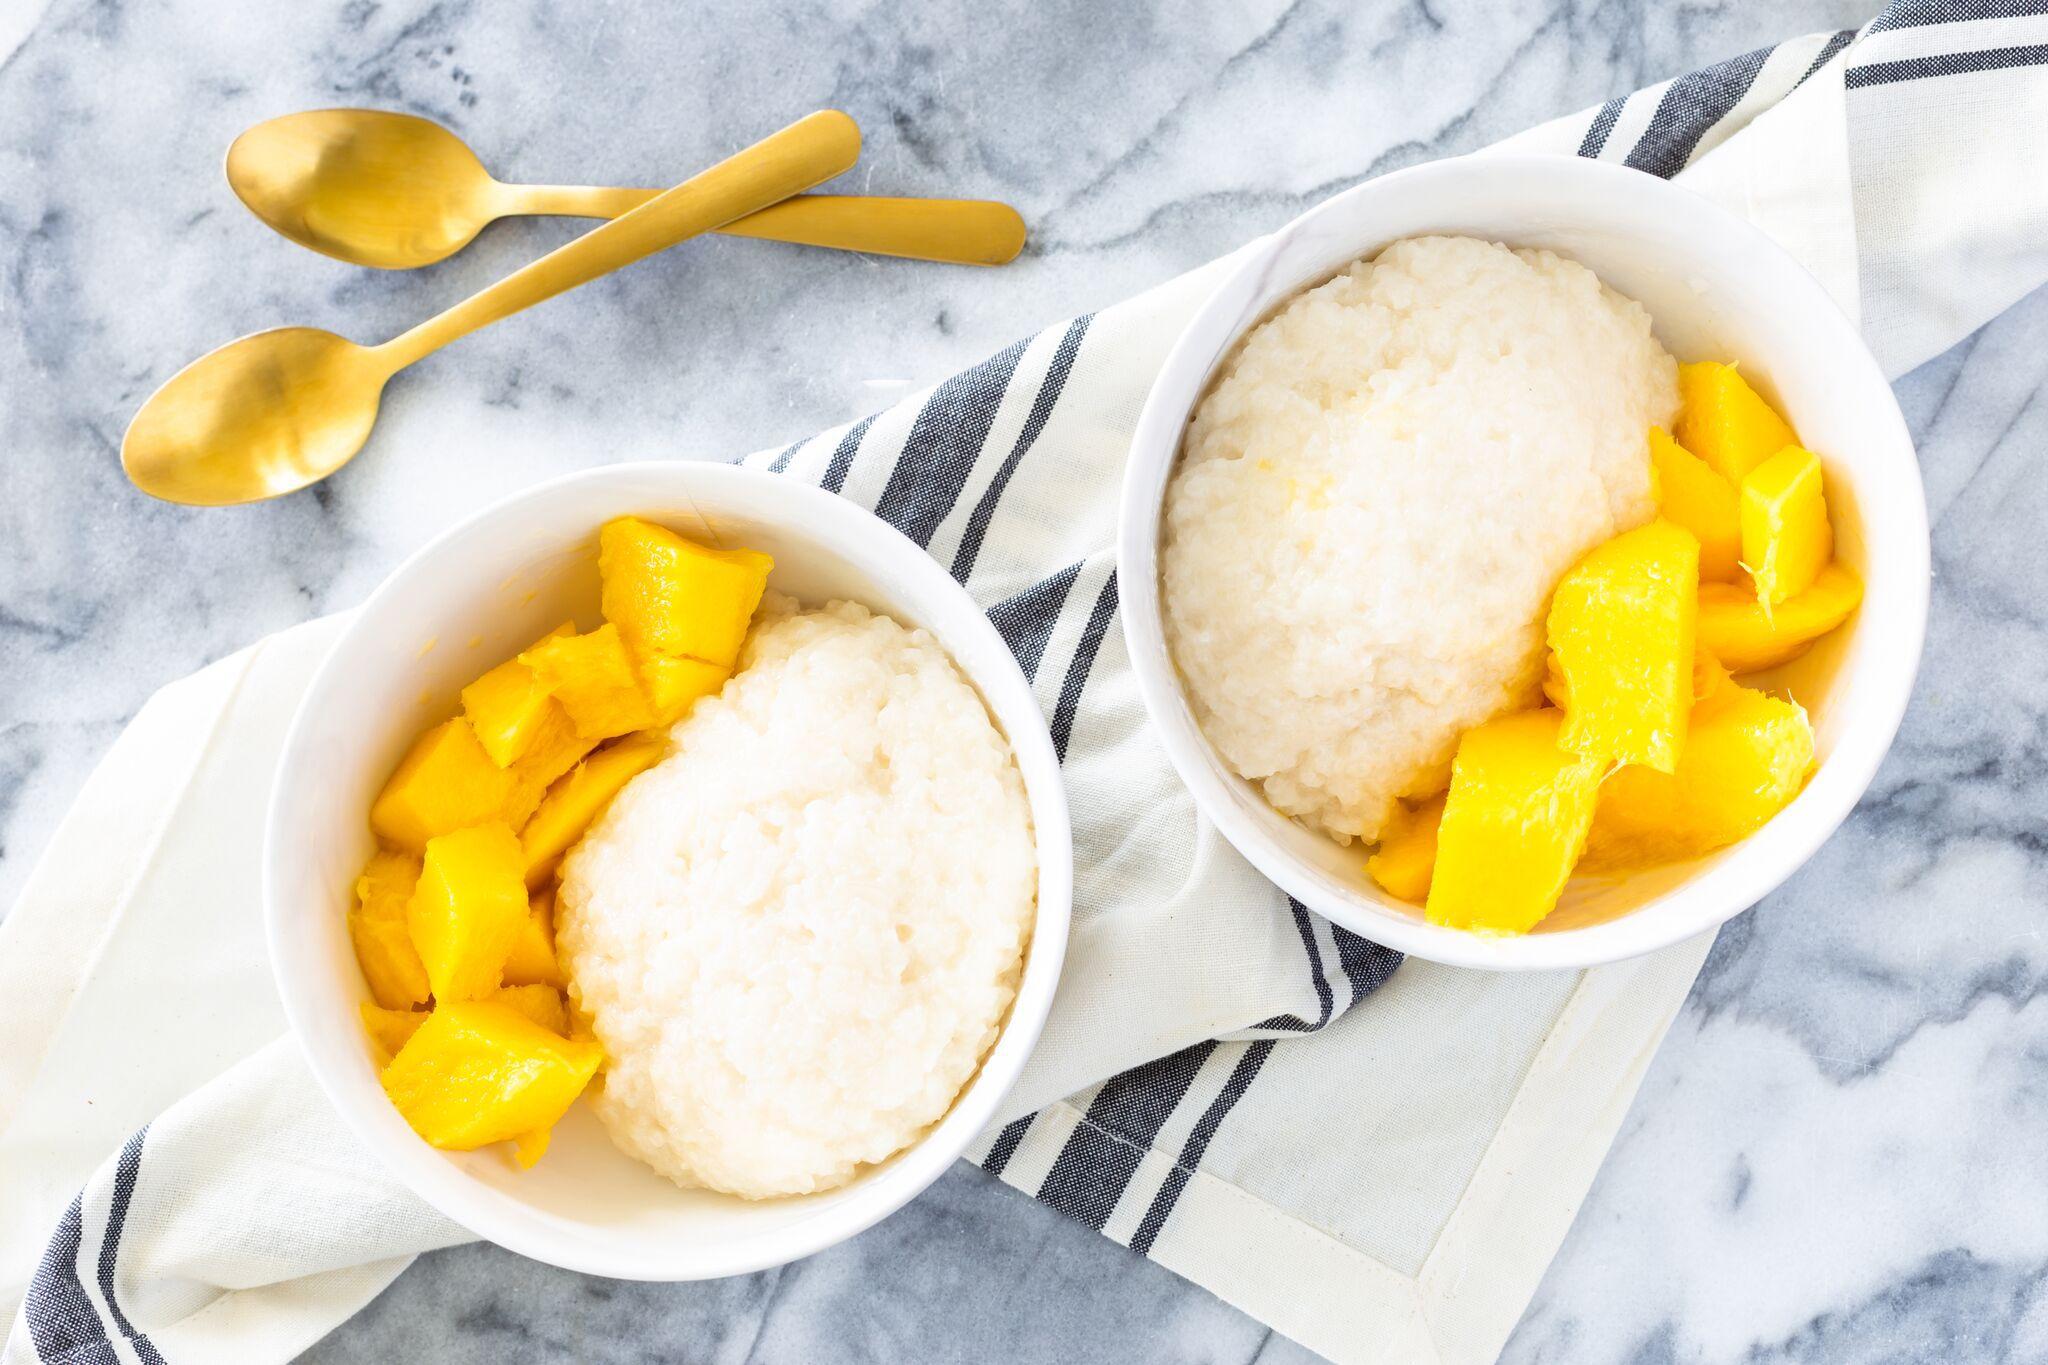 Thai Mango Sticky Rice Dessert (Khao Niaow Ma Muang) Recipe